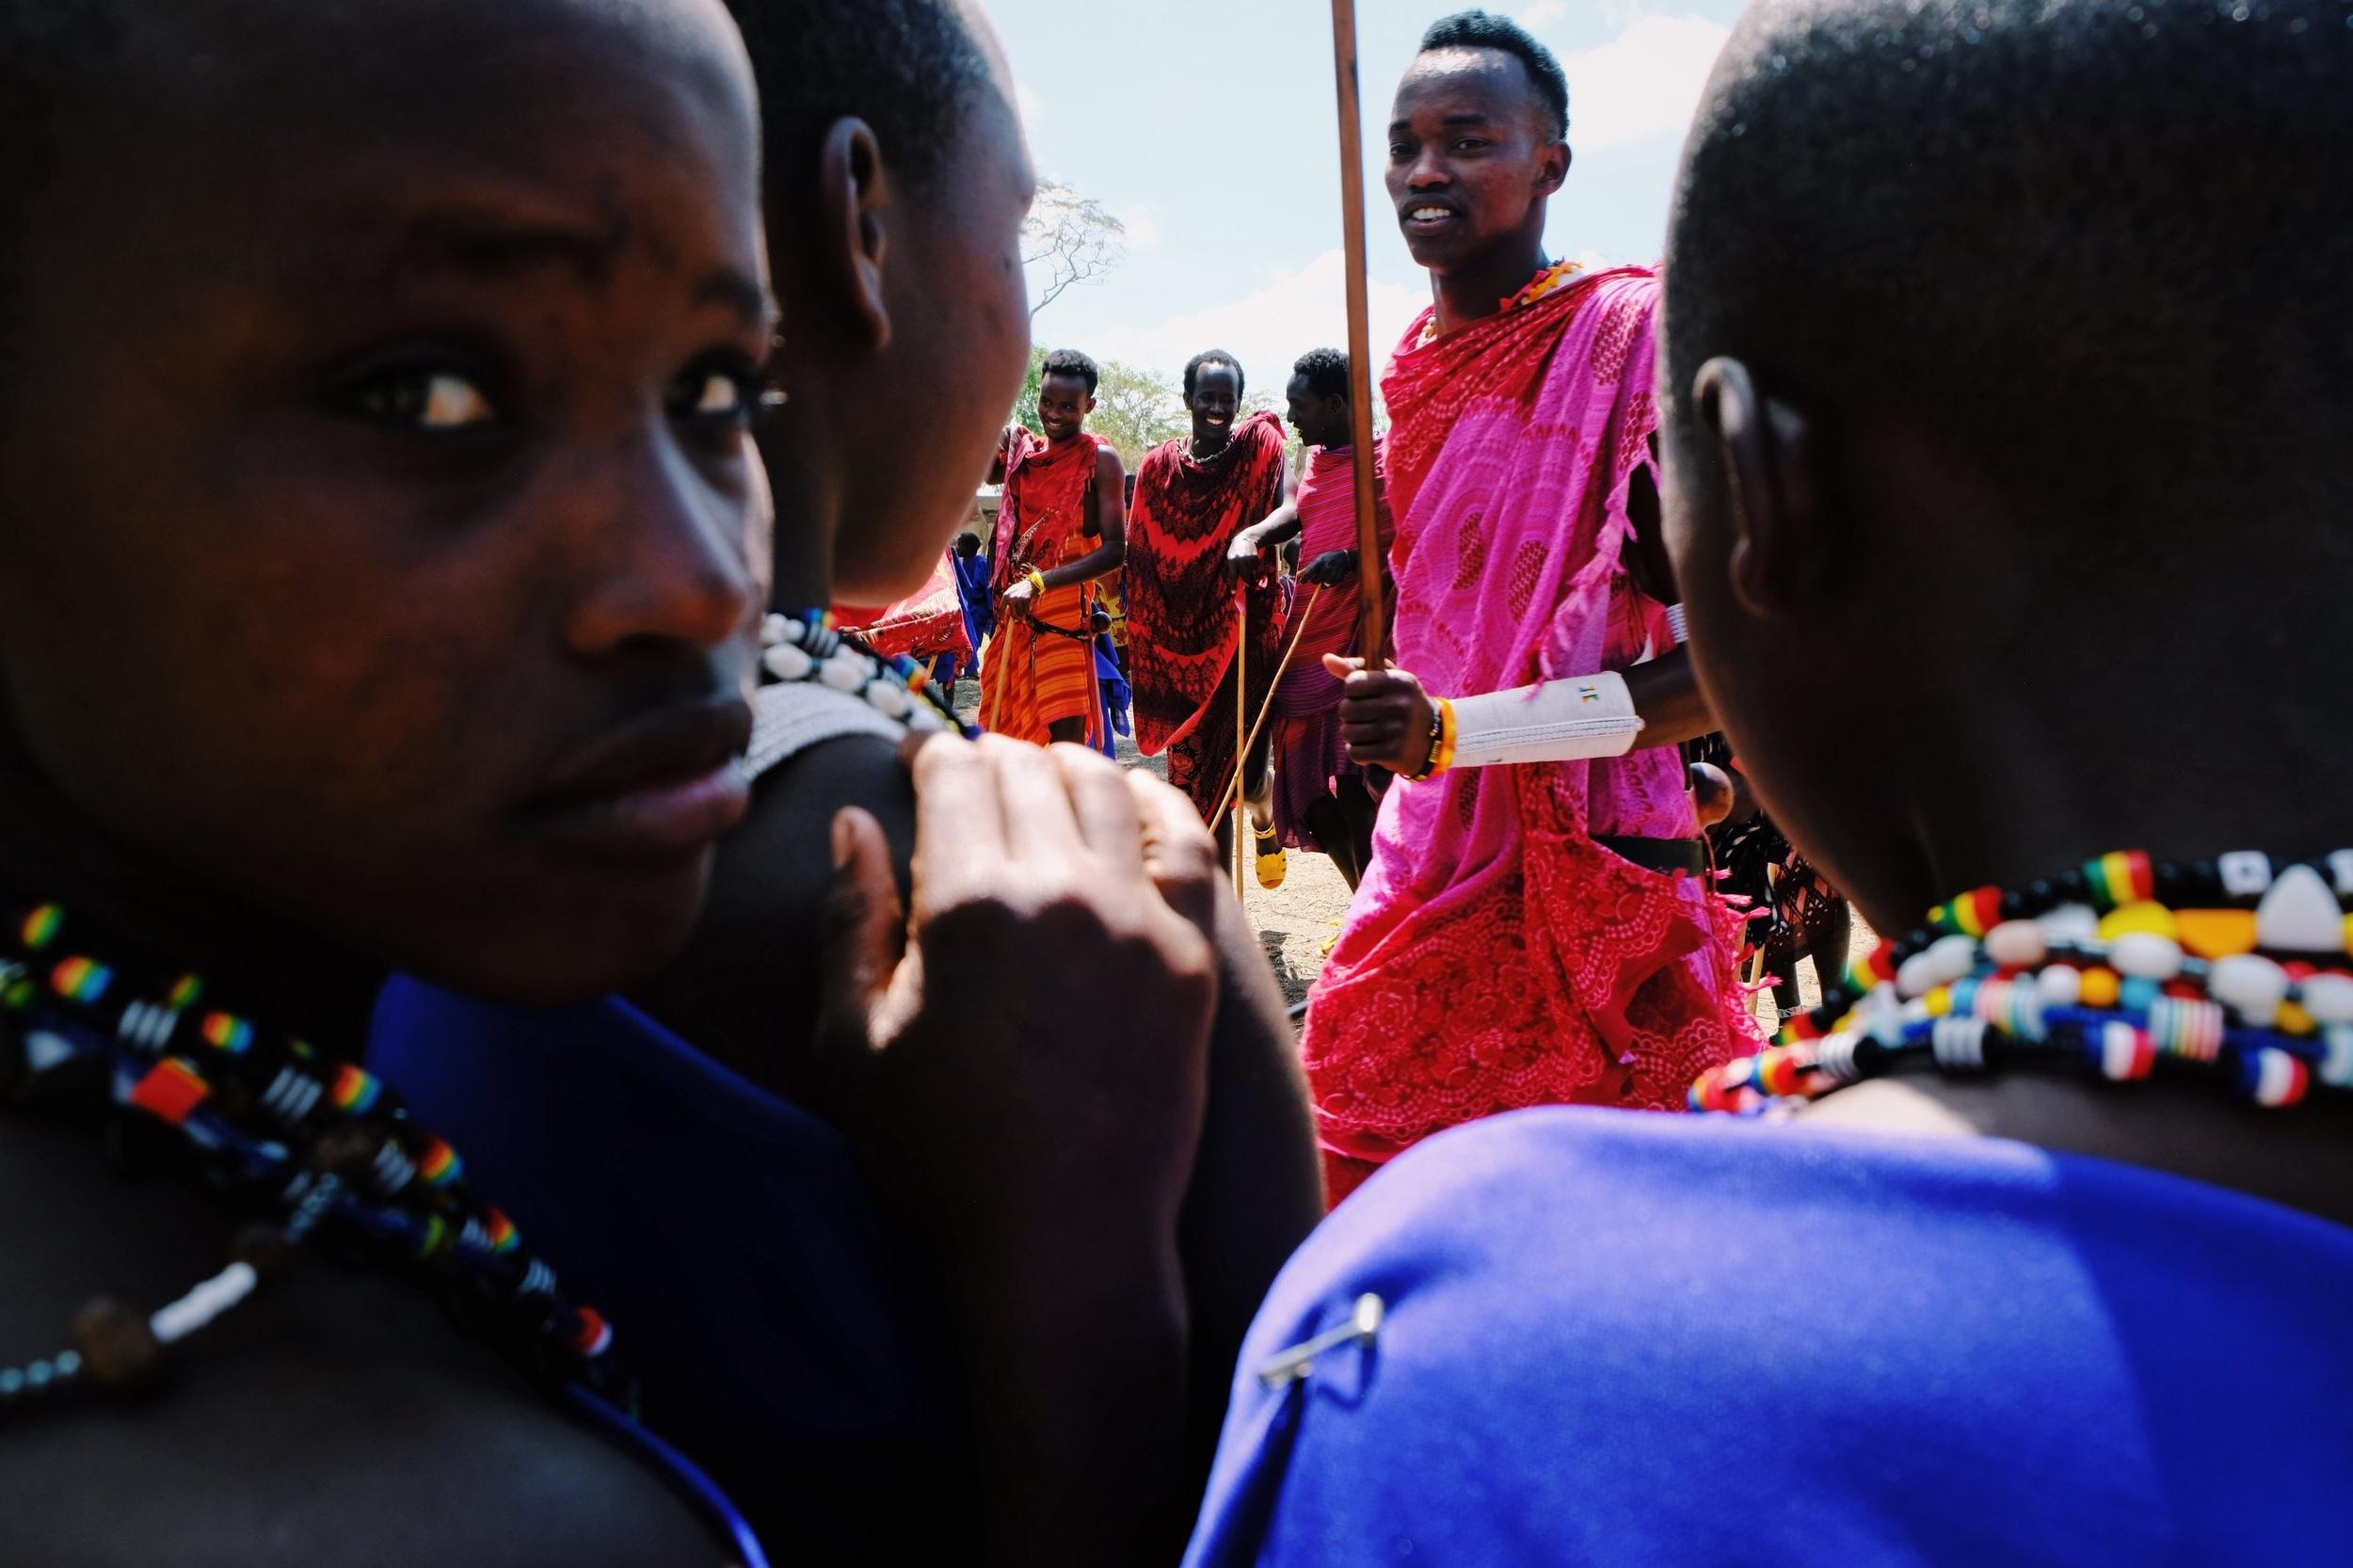 Morans+and+masai+girls+in+Kilindi+Tanzania.jpg